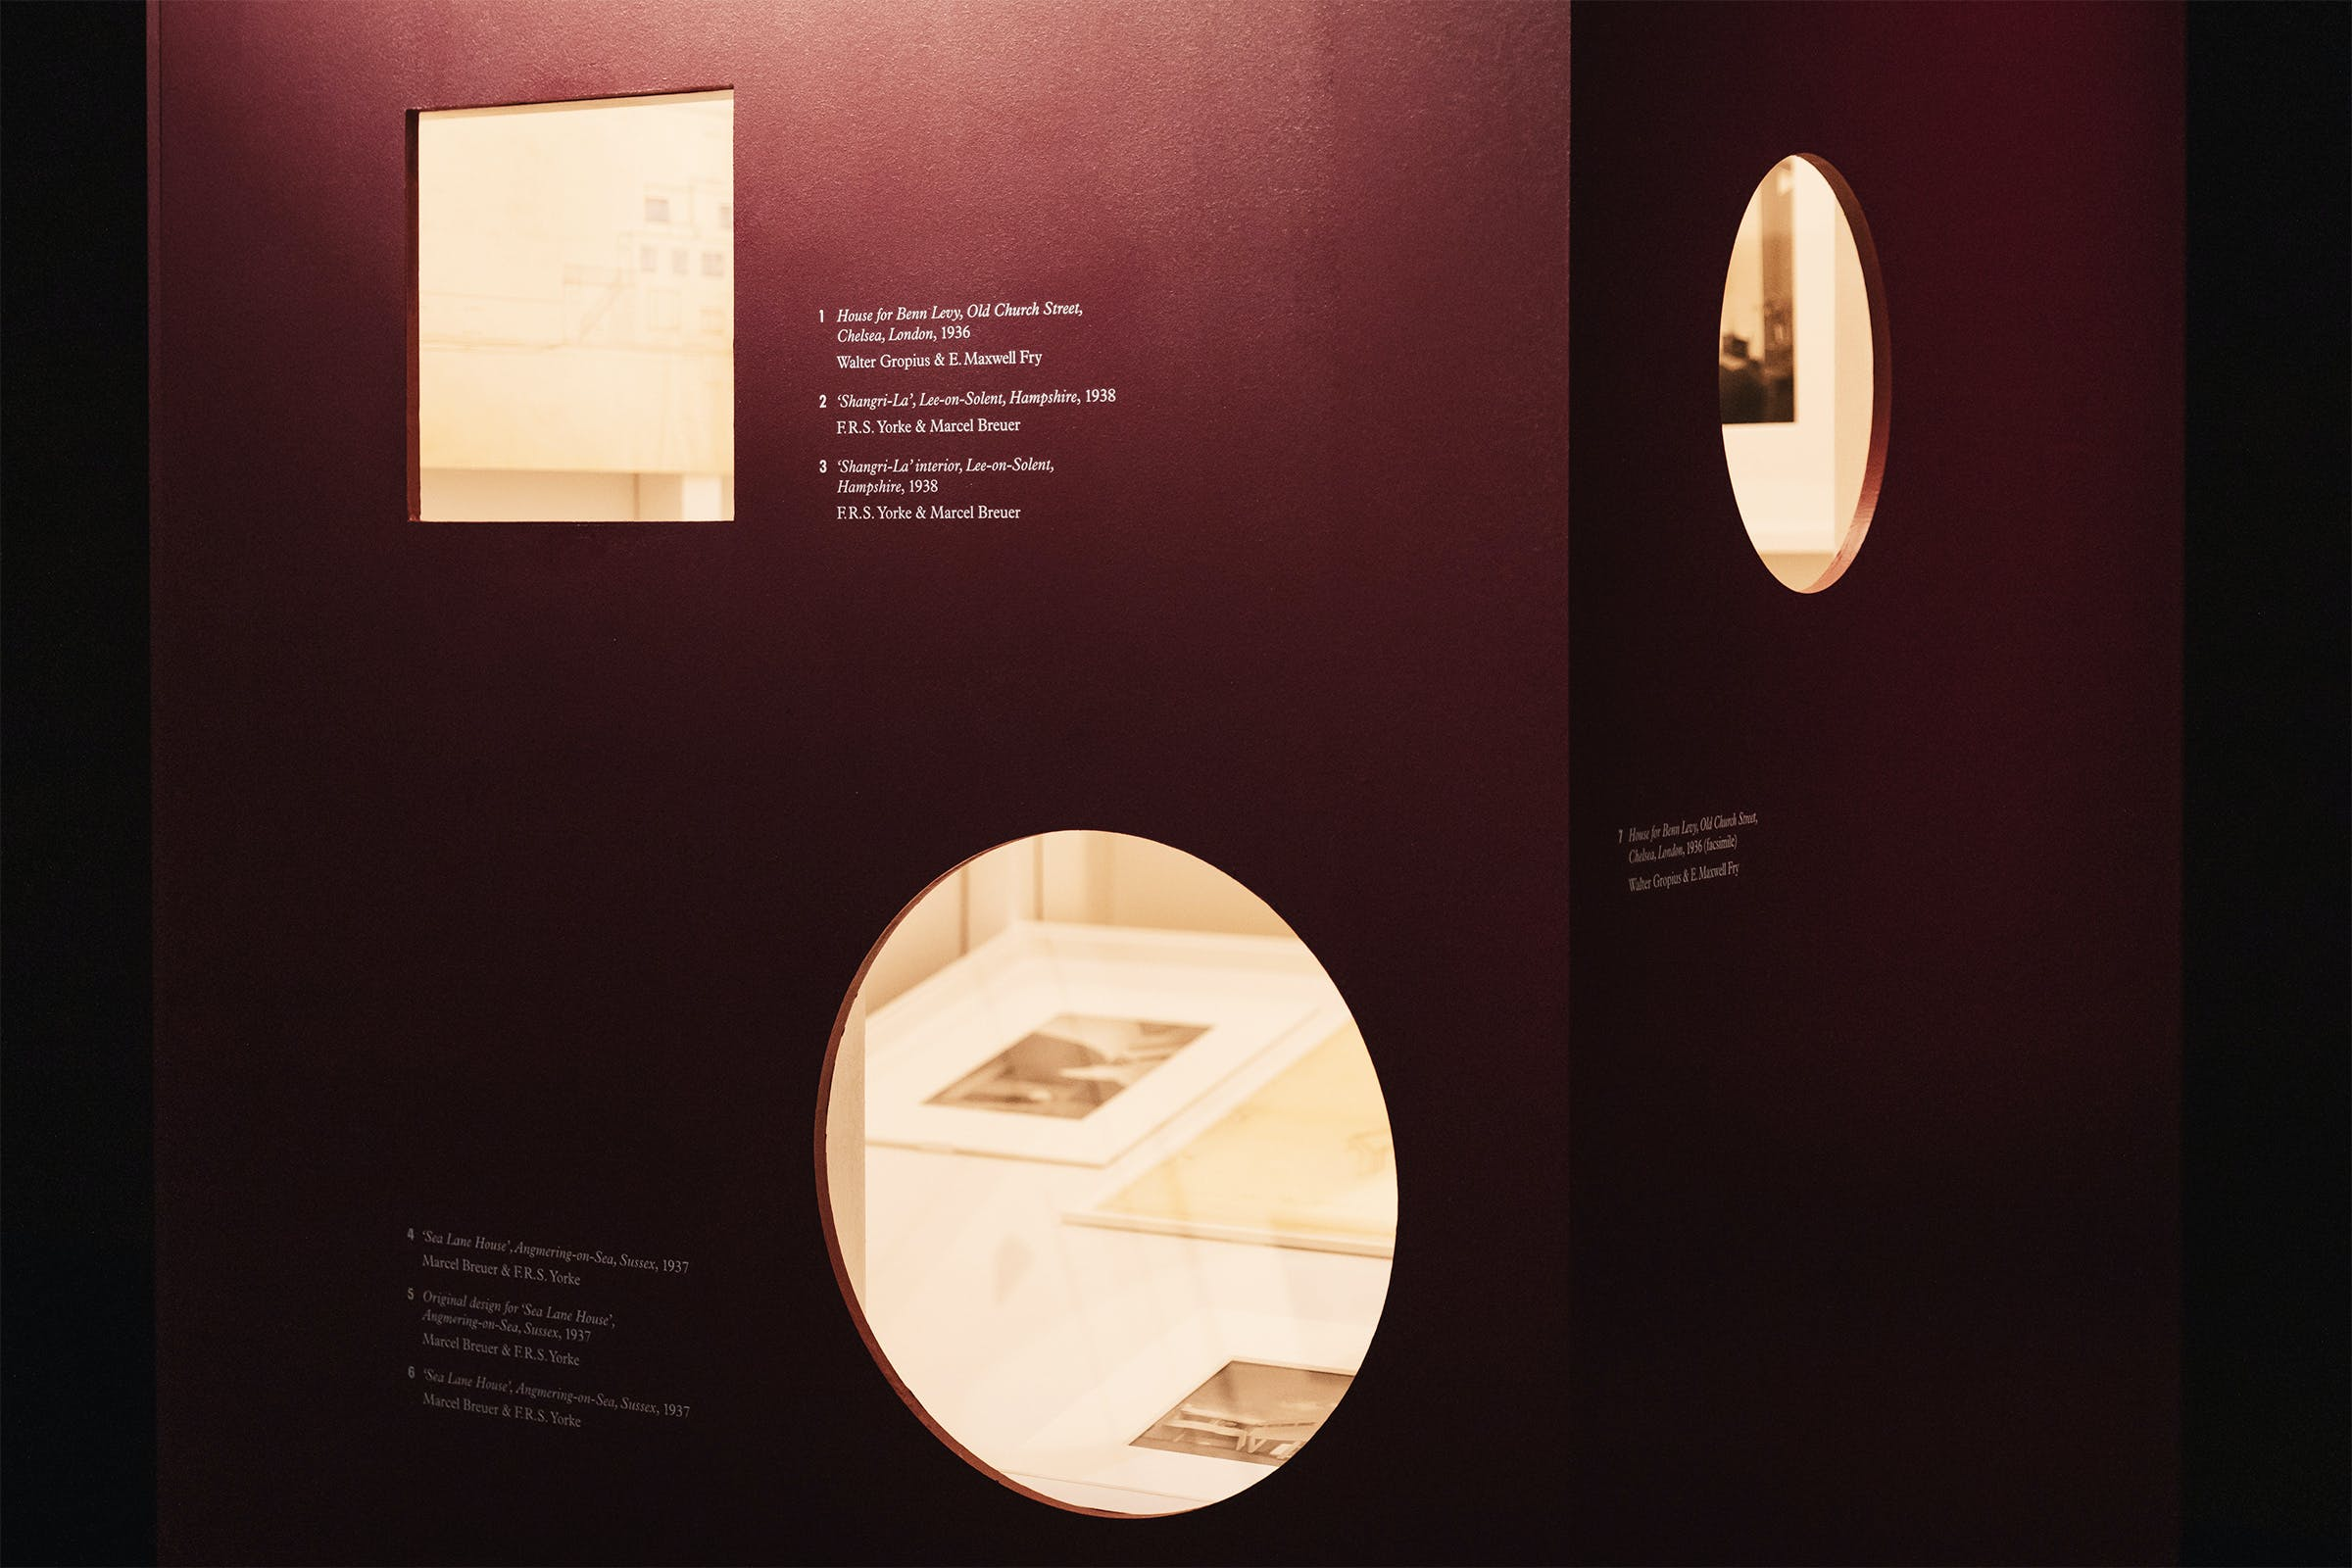 Wolfe Hall, Bauhaus, Beyond Bauhaus, RIBA, Exhibition, Gallery Guide, Breue, Gropius, Moholy-Nagy, Graphic Design